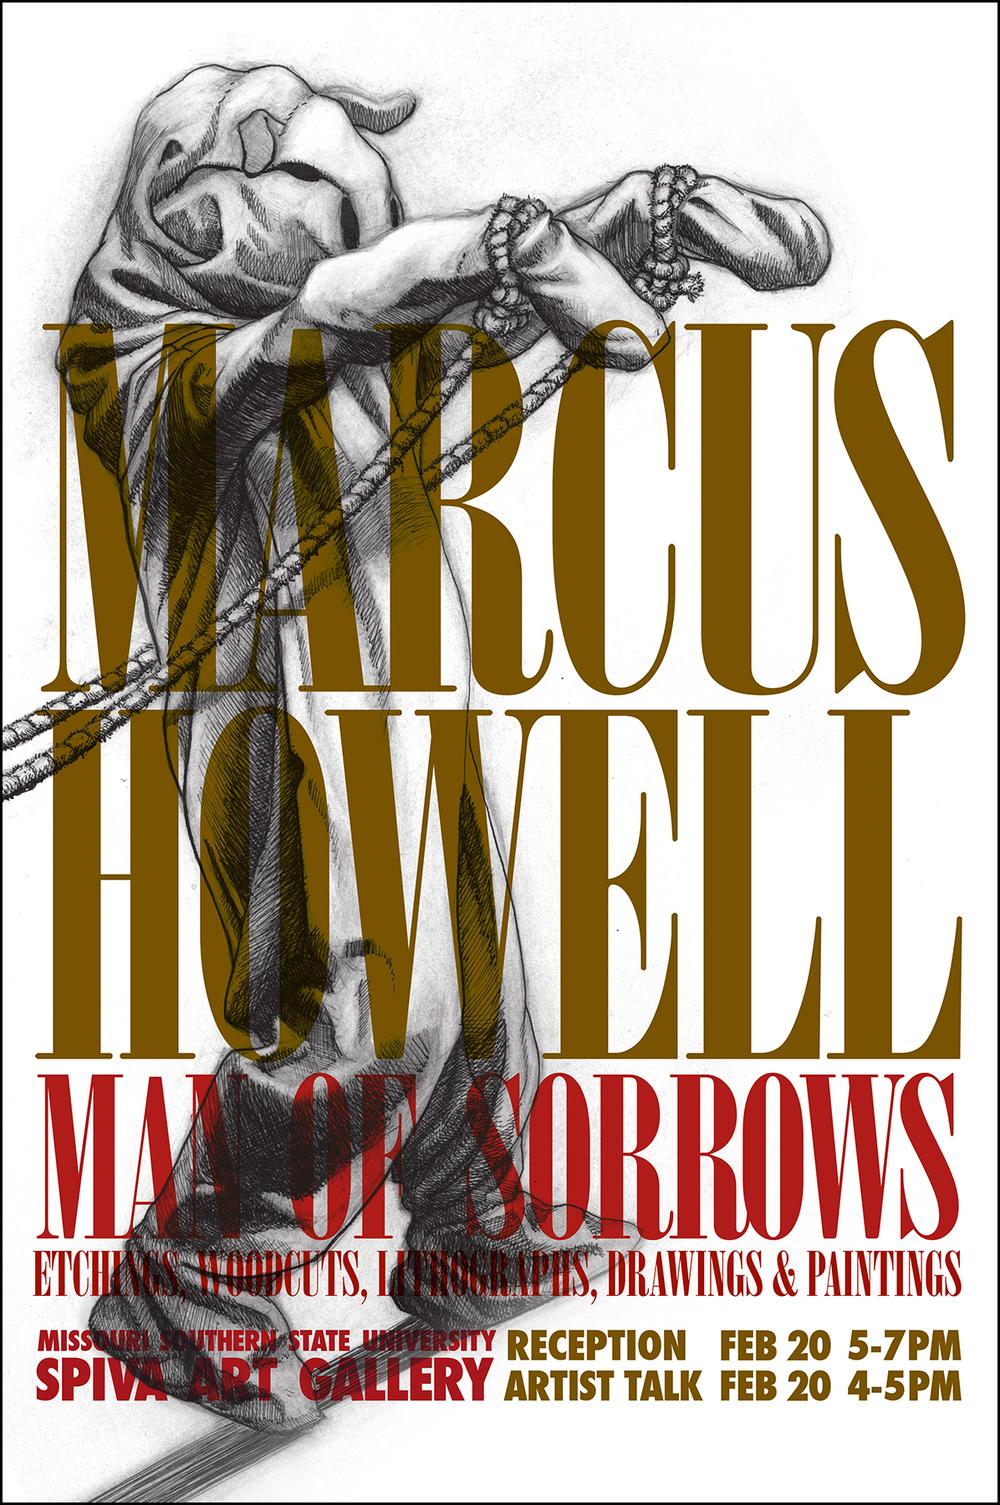 Marcus Howell 24x36